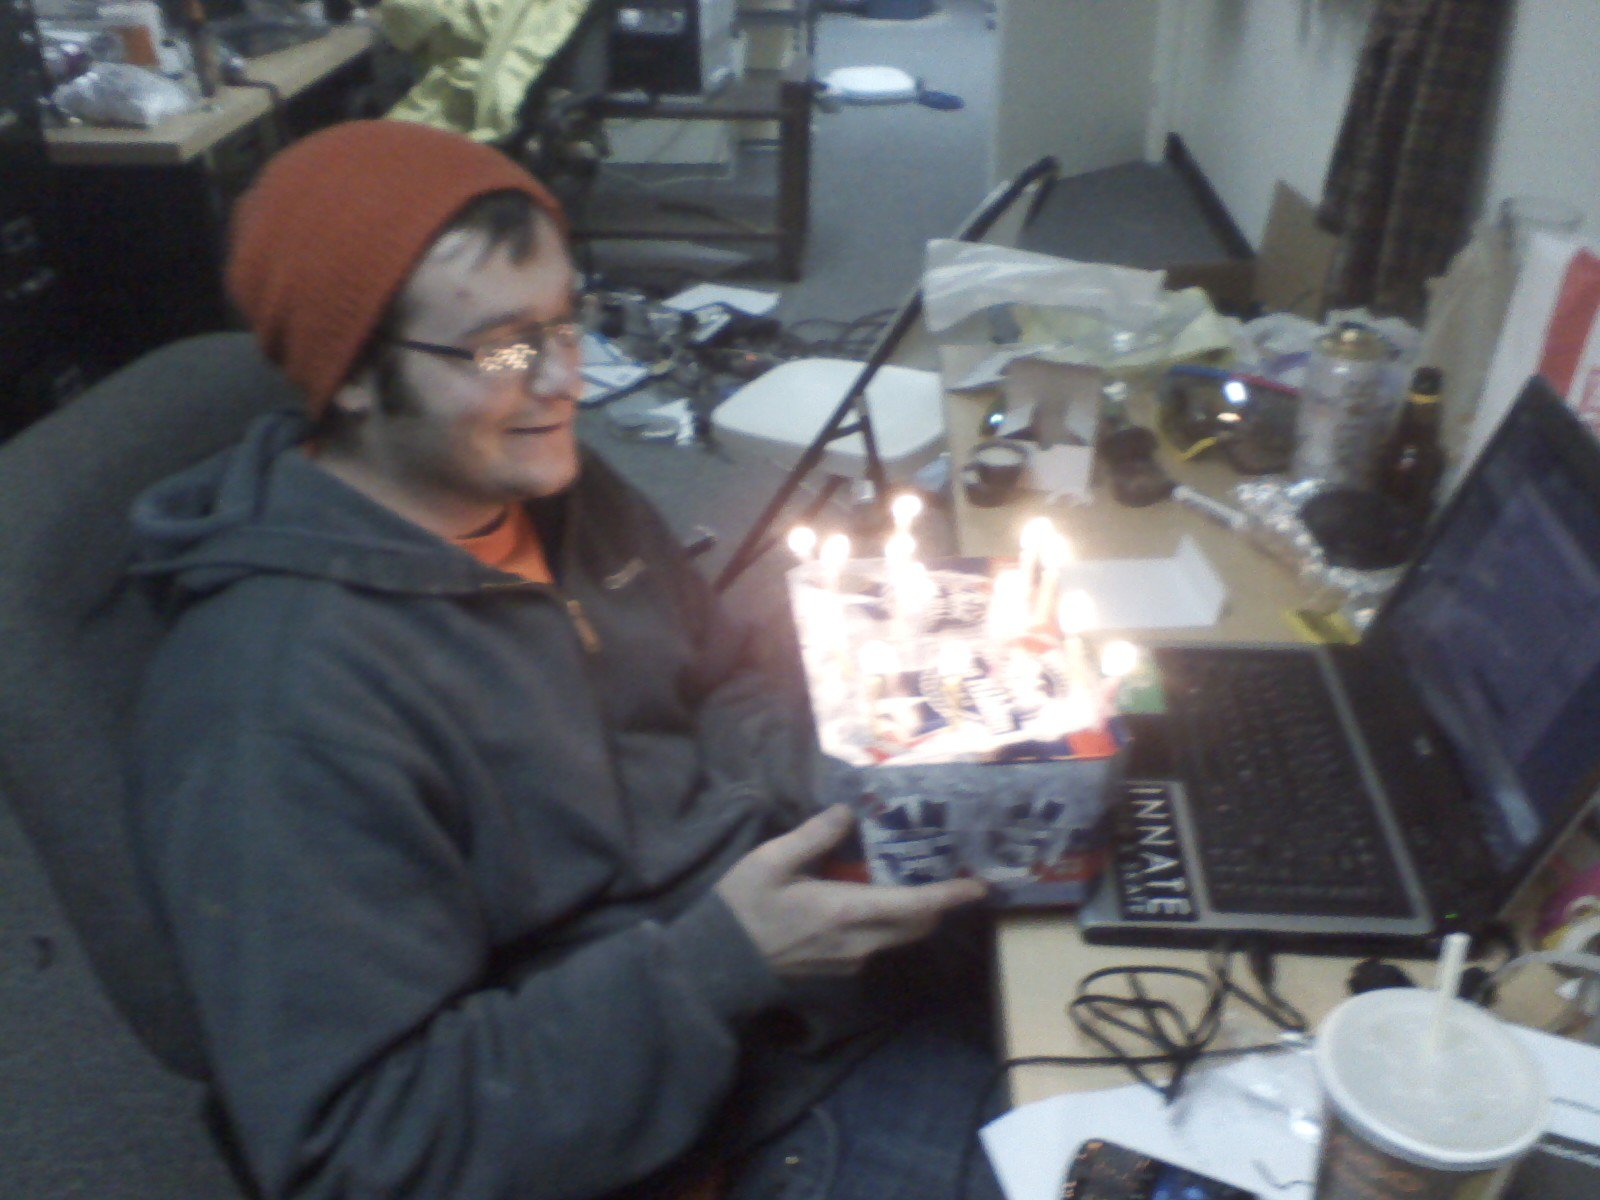 Caylor's Birthday